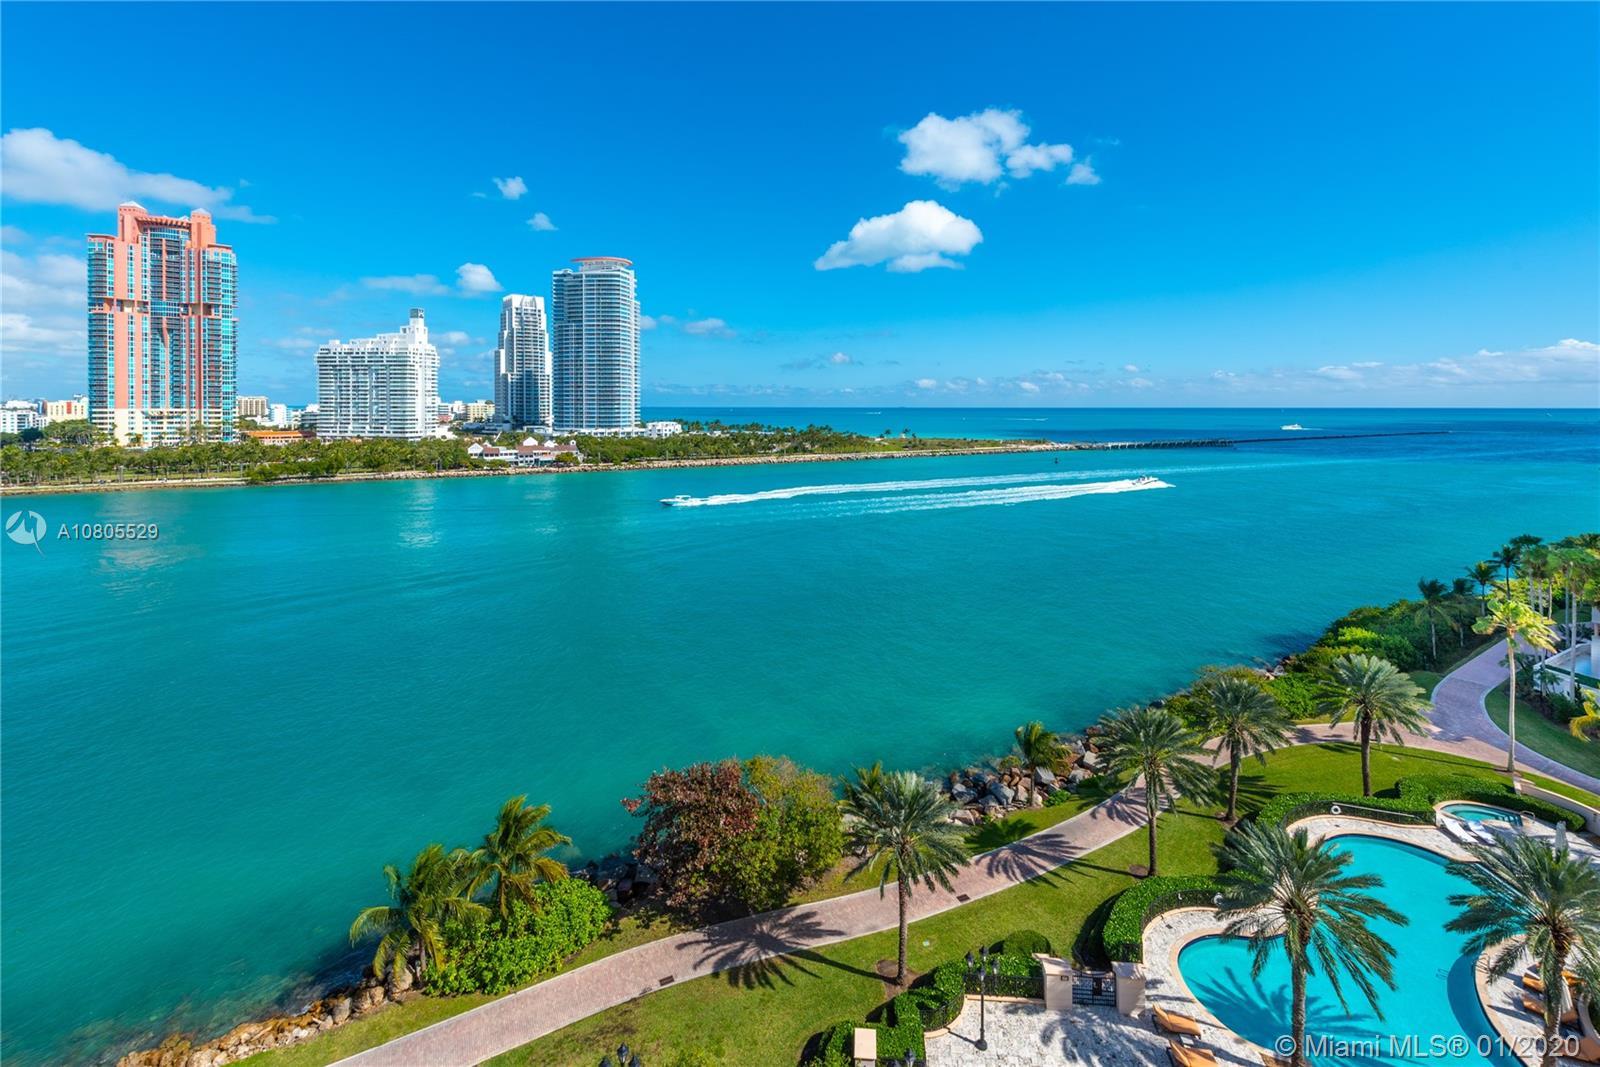 7192 Fisher Island Dr 7192, Miami Beach, FL 33109